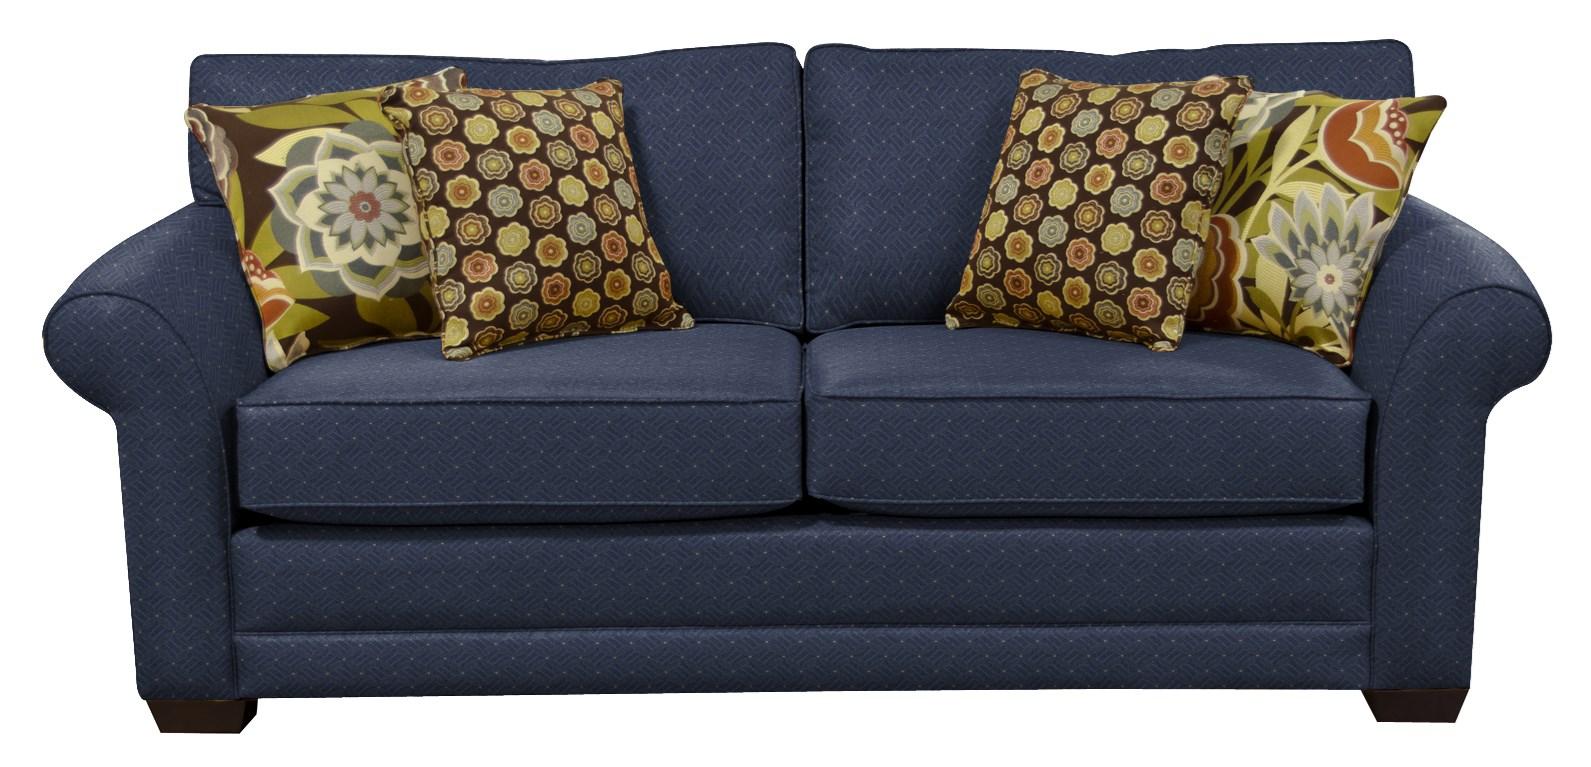 Brantley Queen Sleeper with Comfort 3 Mattress by England at Lapeer Furniture & Mattress Center